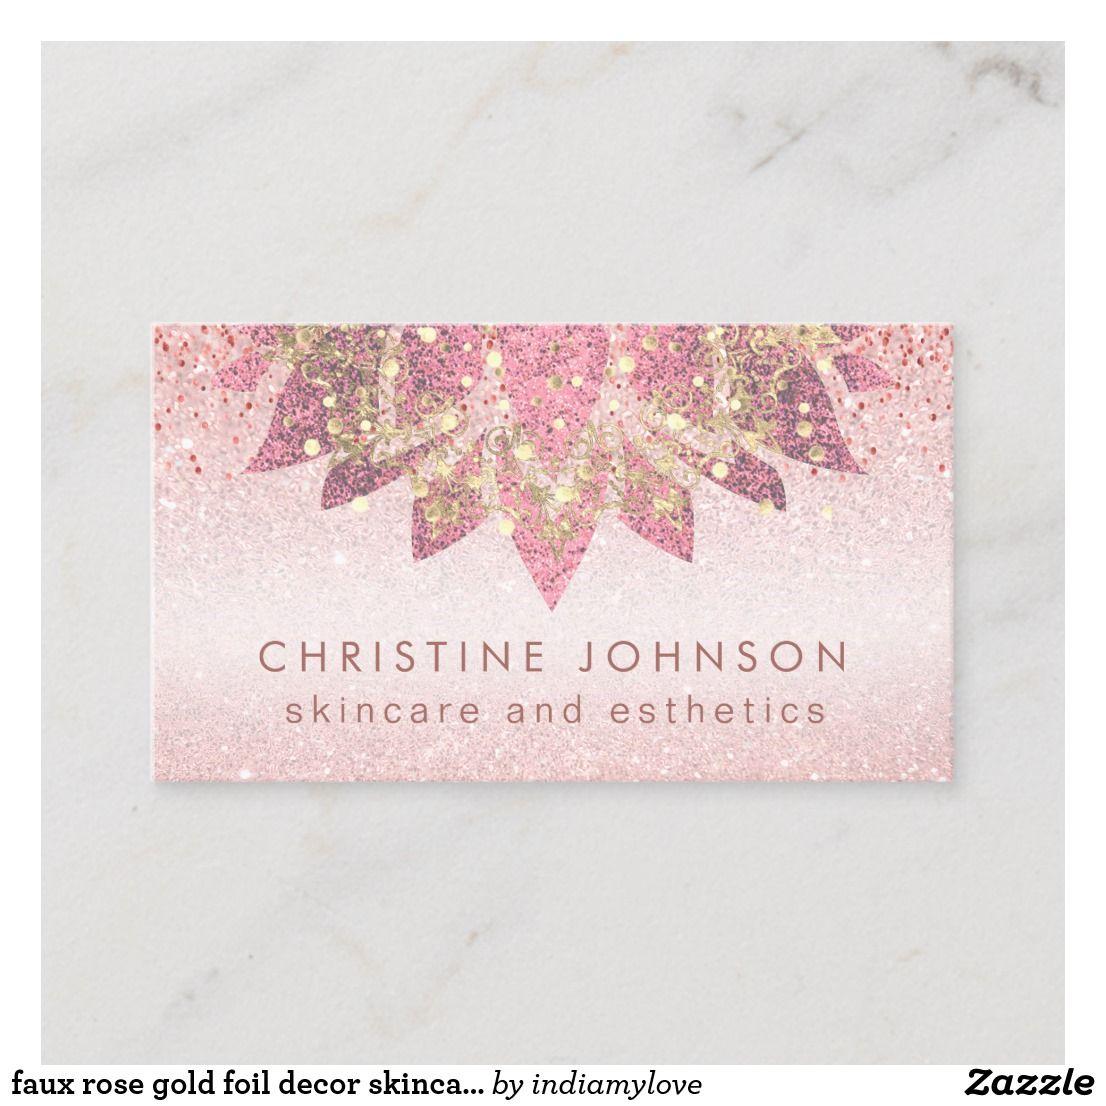 Faux Rose Gold Foil Decor Skincare And Esthetics Business Card Zazzle Com In 2021 Glitter Business Cards Foil Decor Rose Gold Business Card